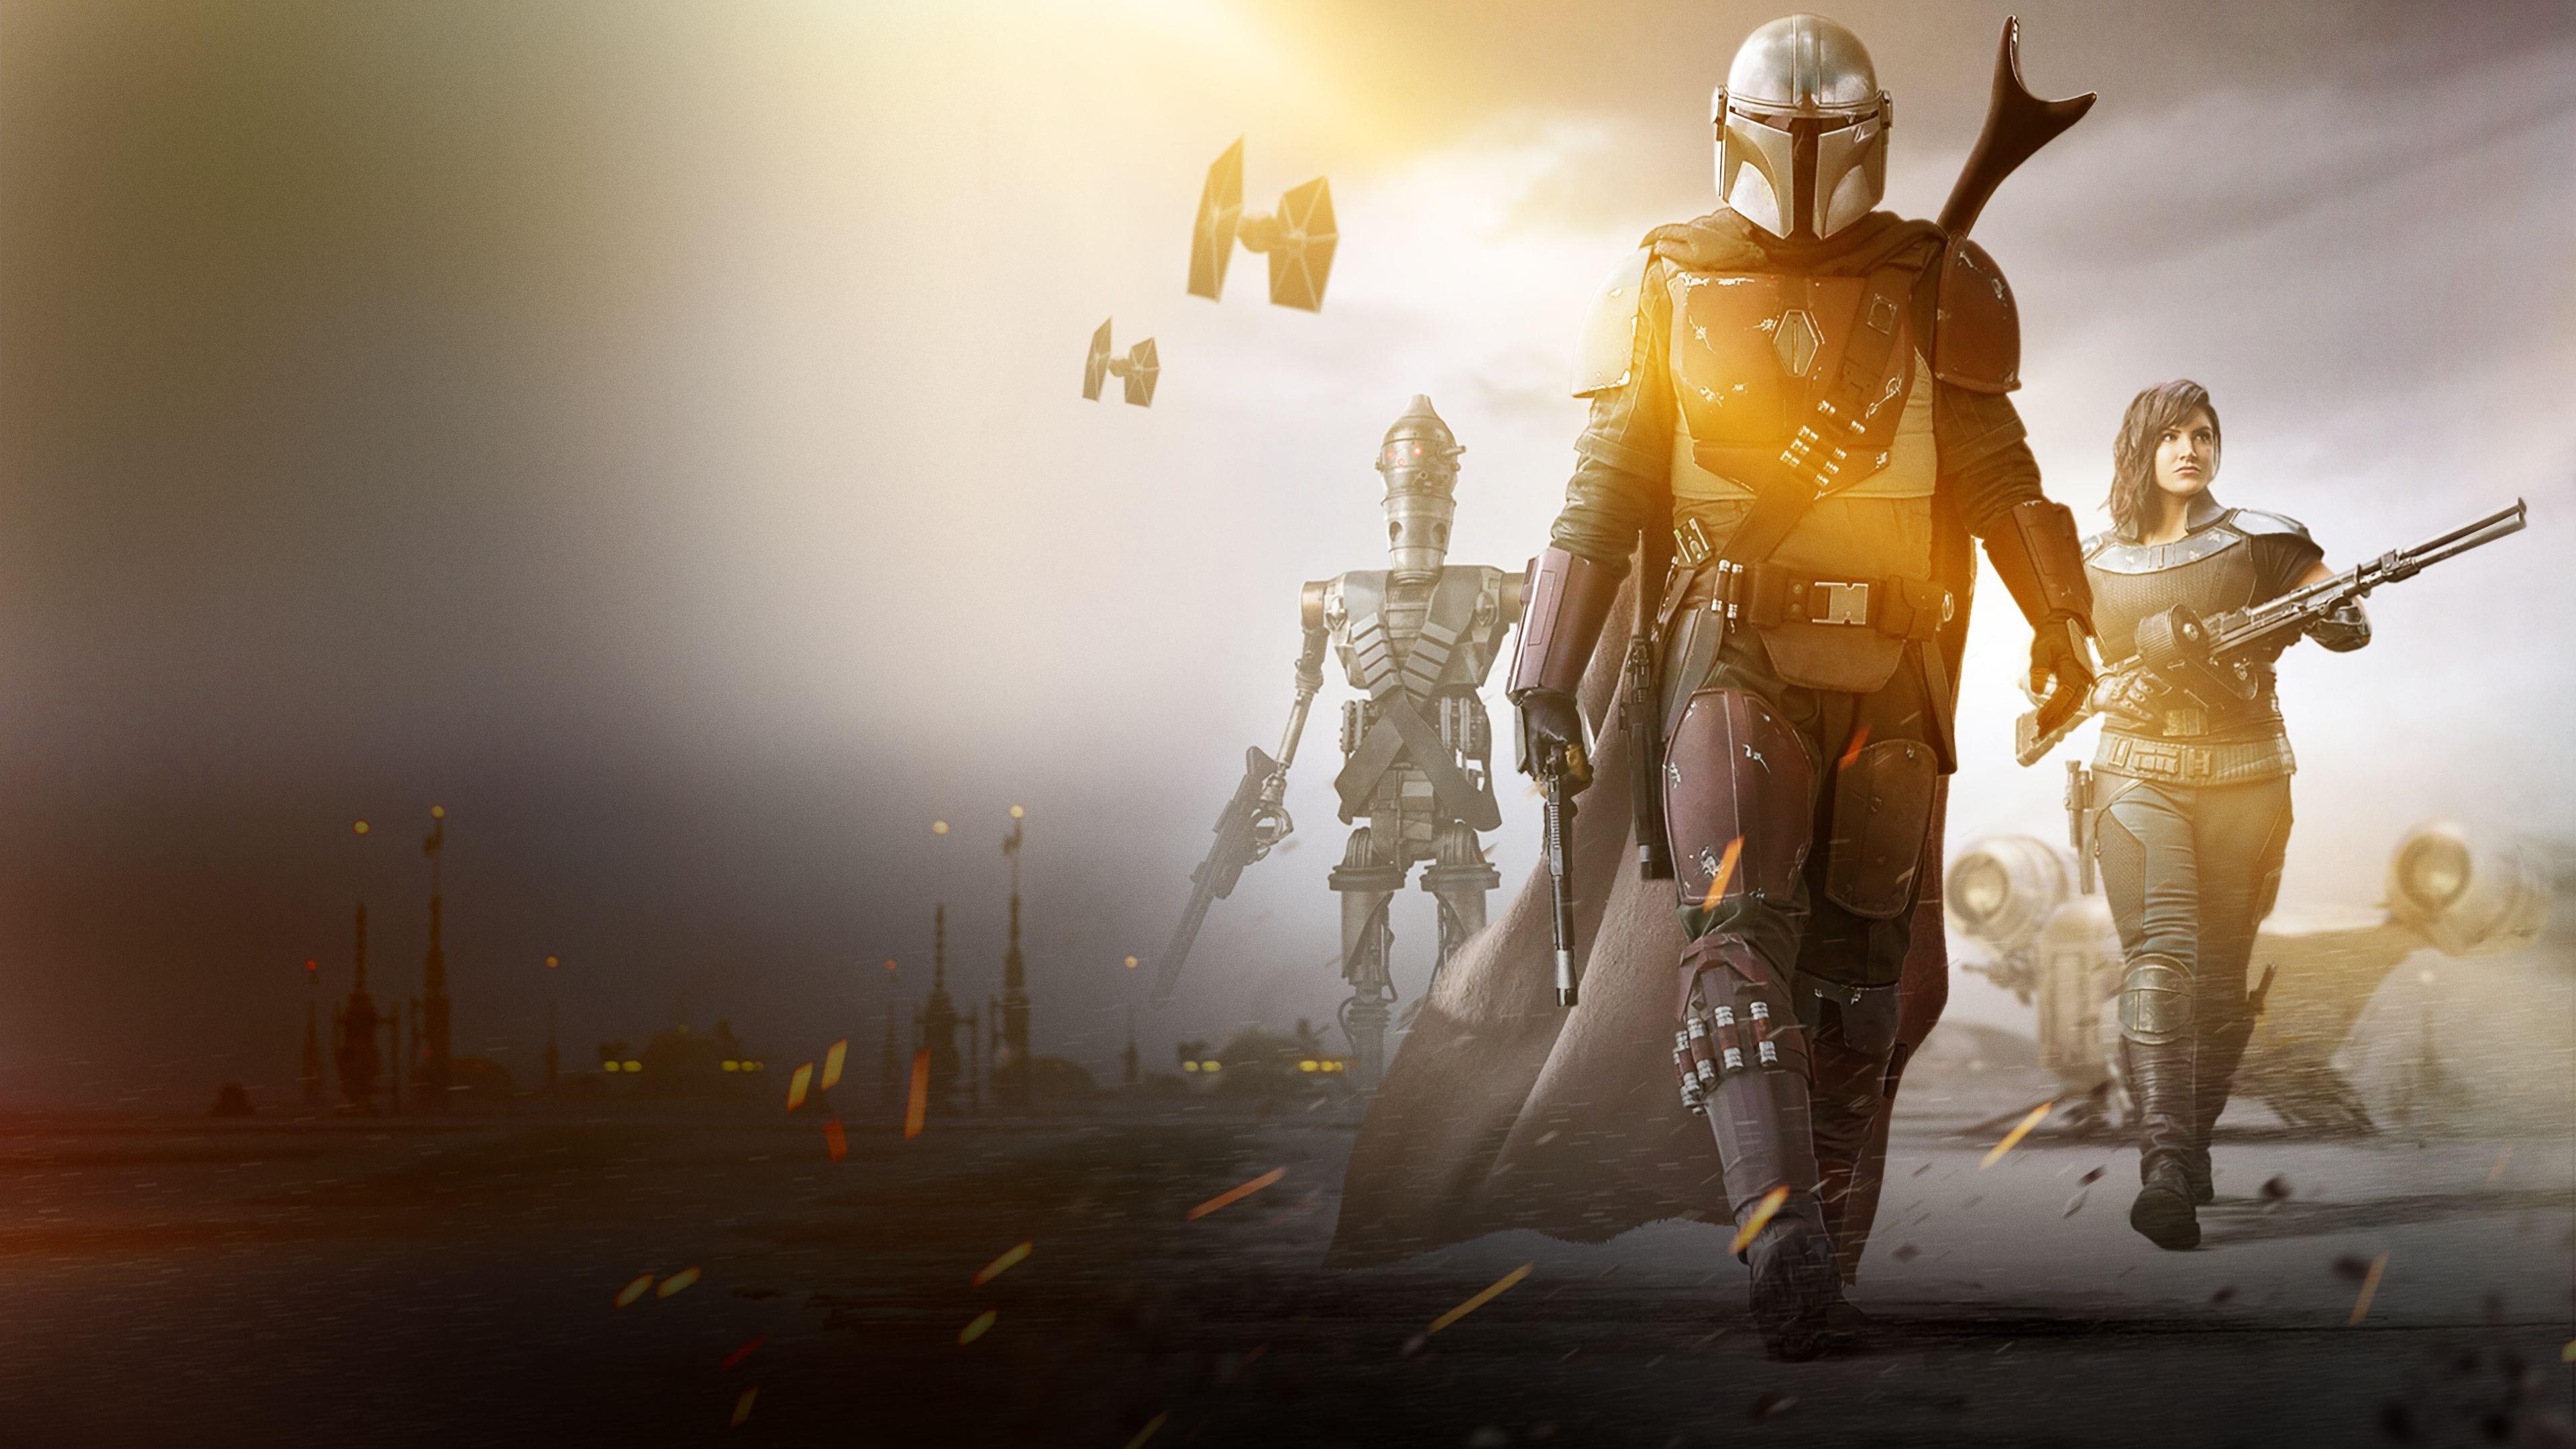 General 3840x2160 The Mandalorian Star Wars science fiction TV Series